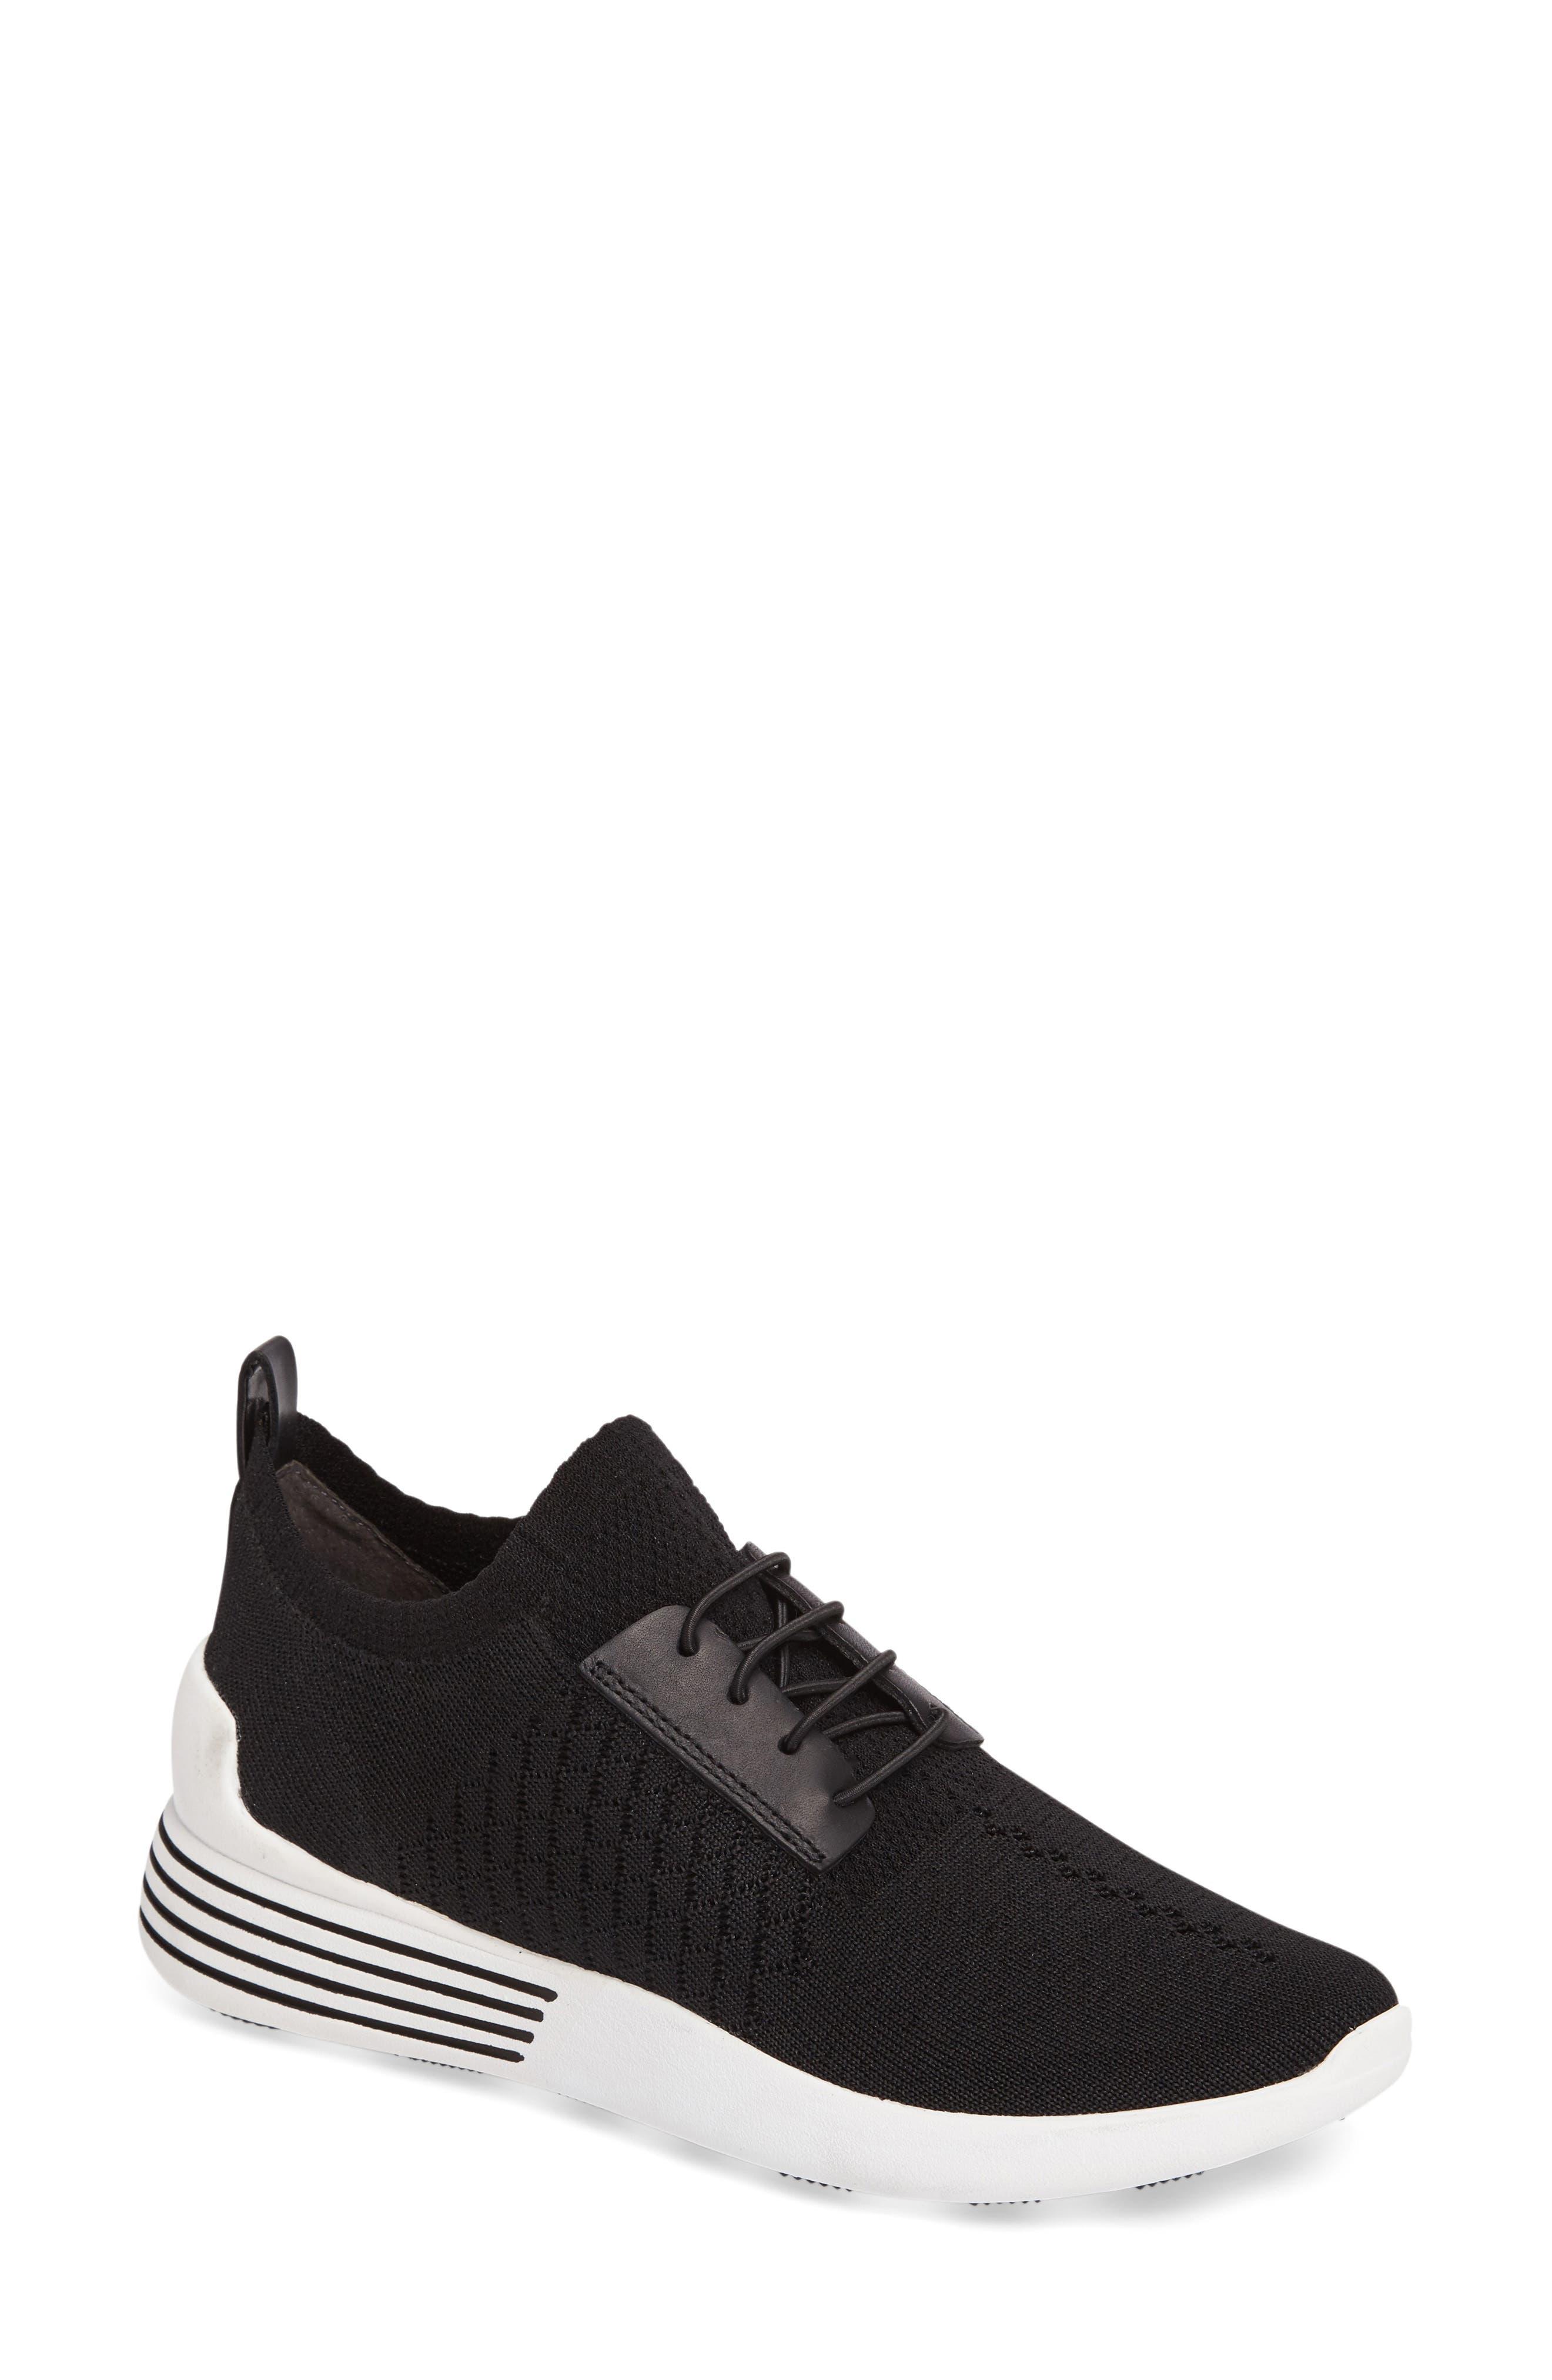 Brandy Woven Sneaker,                         Main,                         color, 001